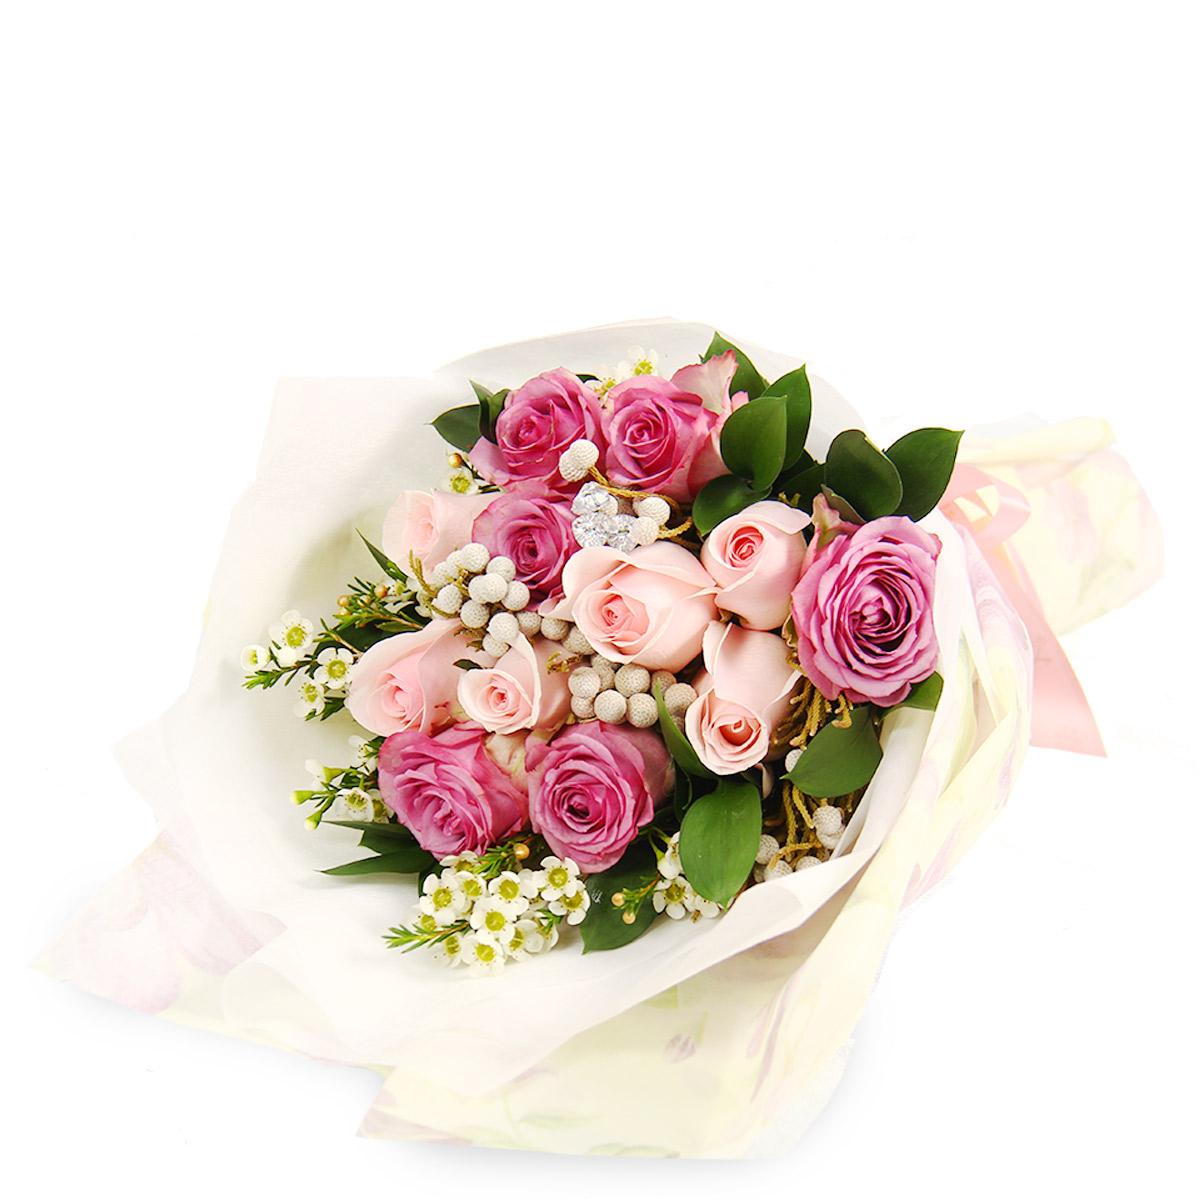 DM1701 Glamorous Elegance pink yam roses bq